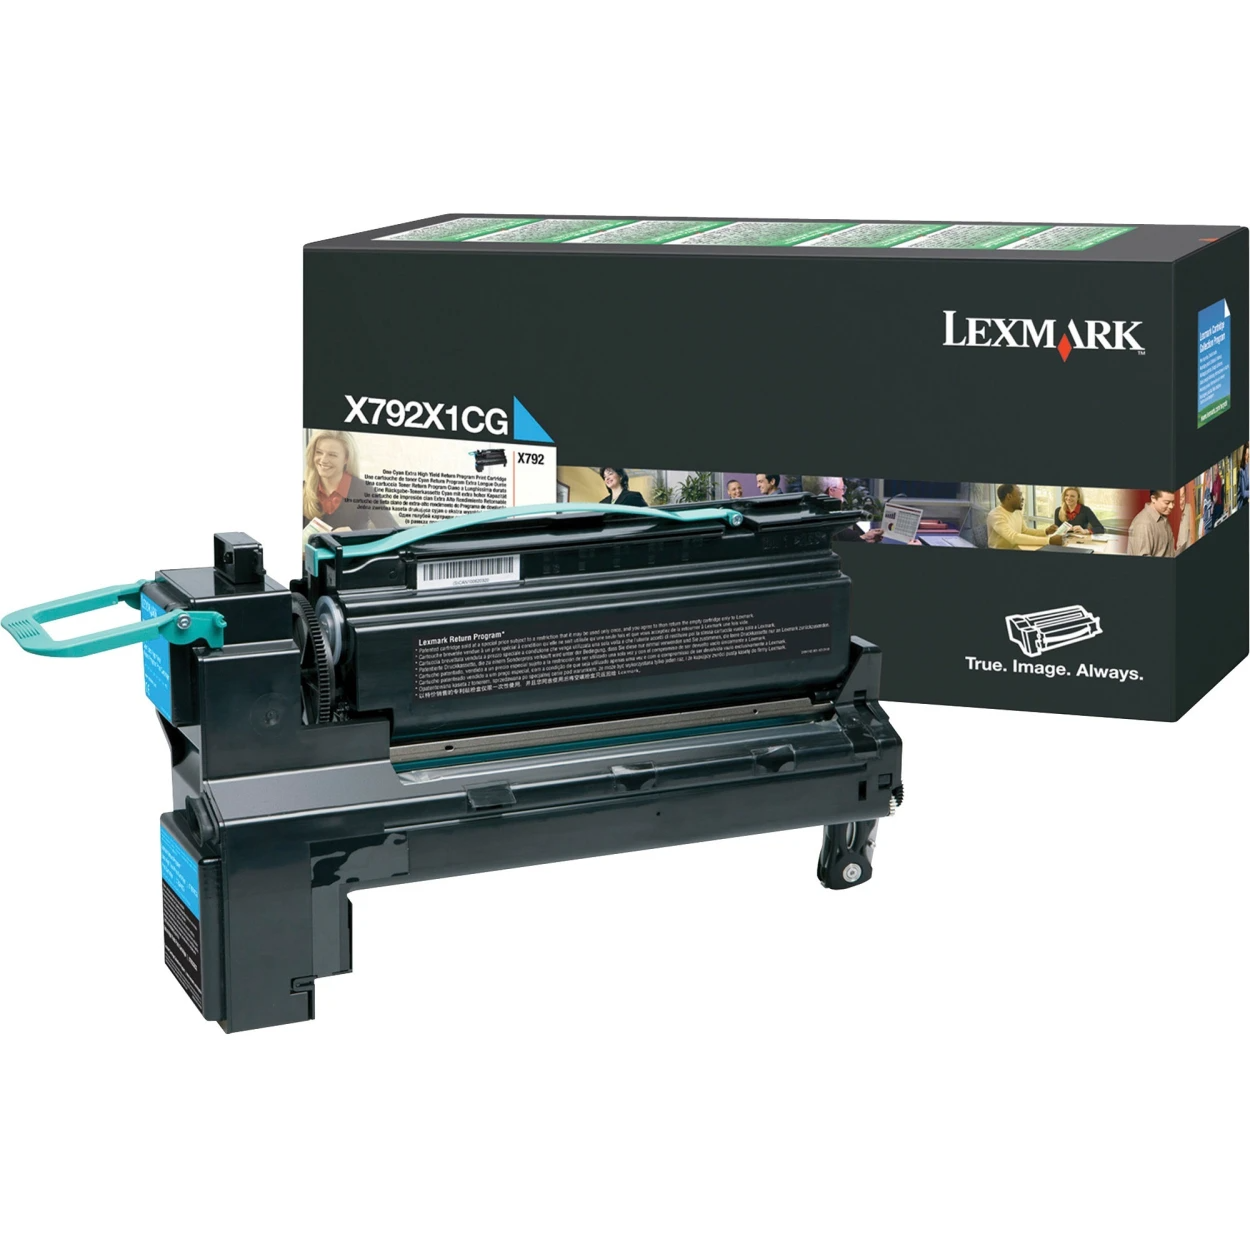 Original Lexmark X792 Return Program Extra High-Yield Laser Toner Cartridge  Cyan